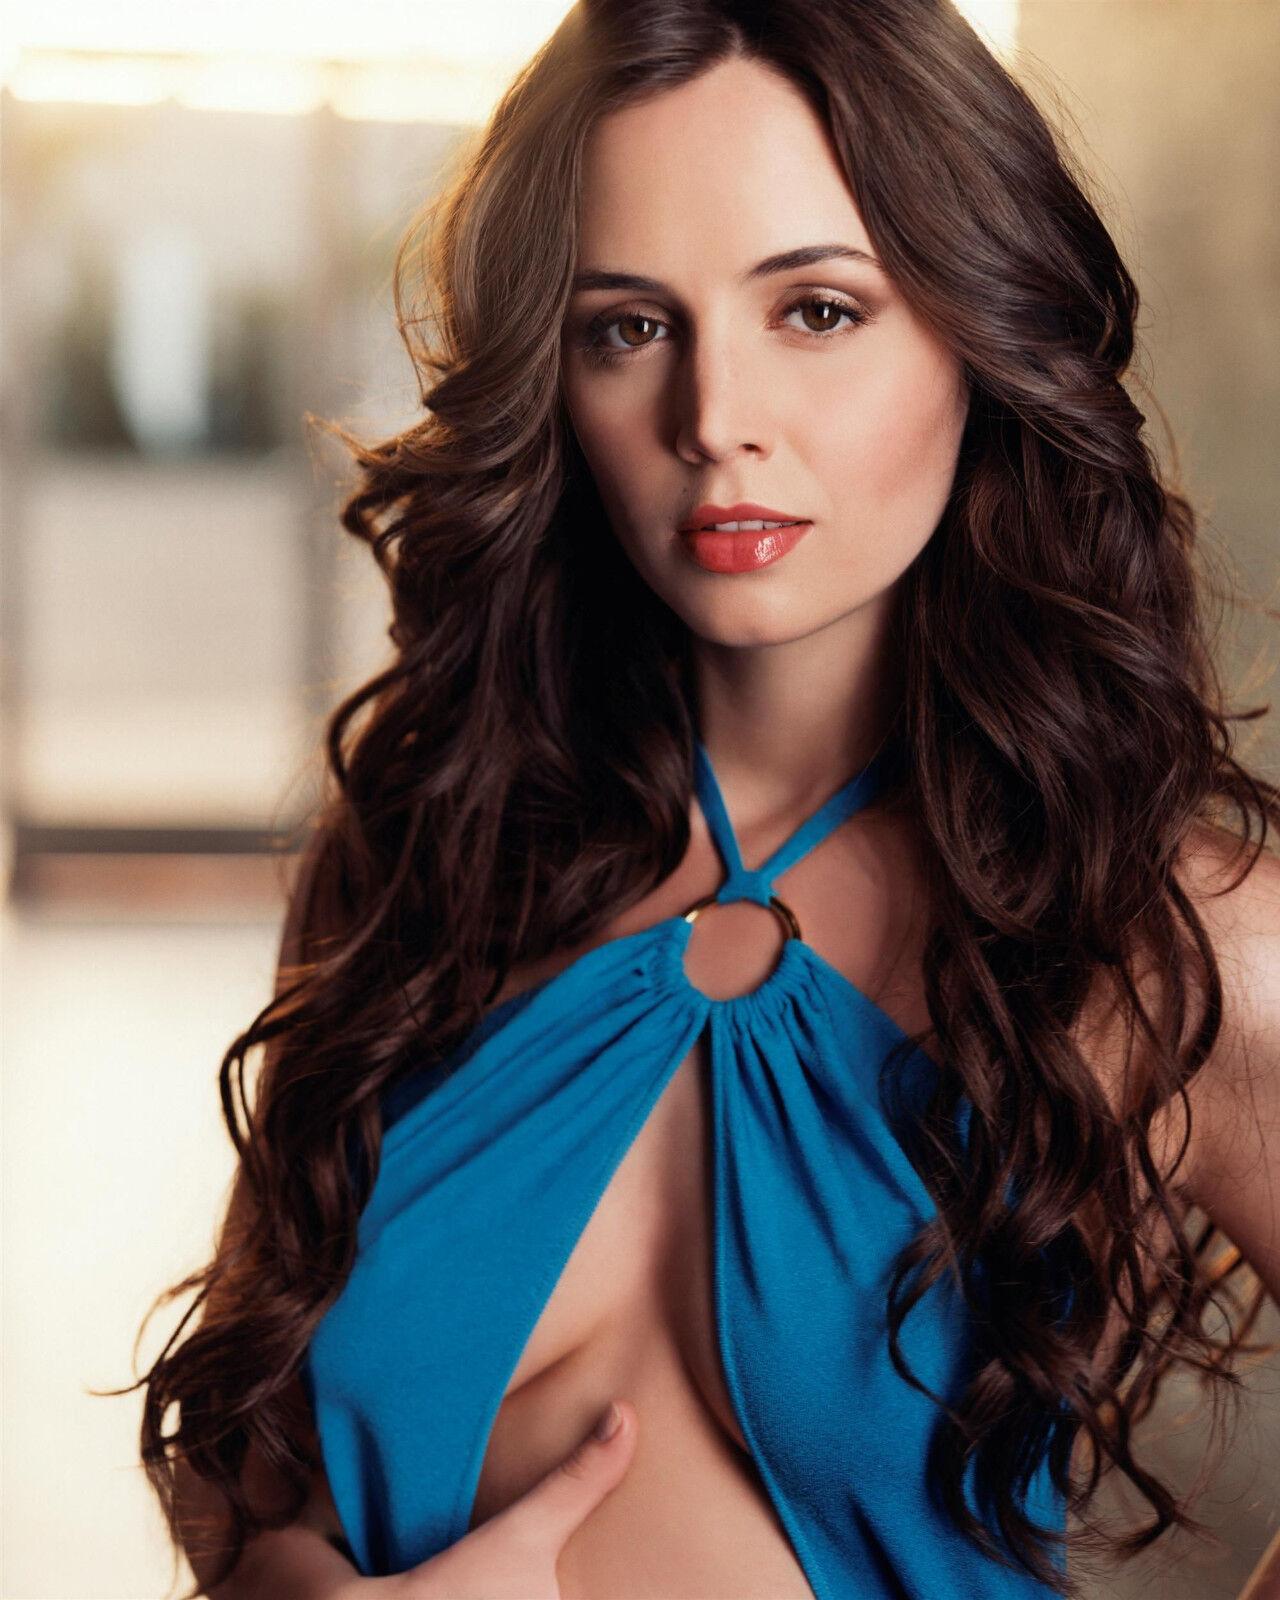 Eliza dushku 8x10 celebrity photo picture pic hot sexy 50